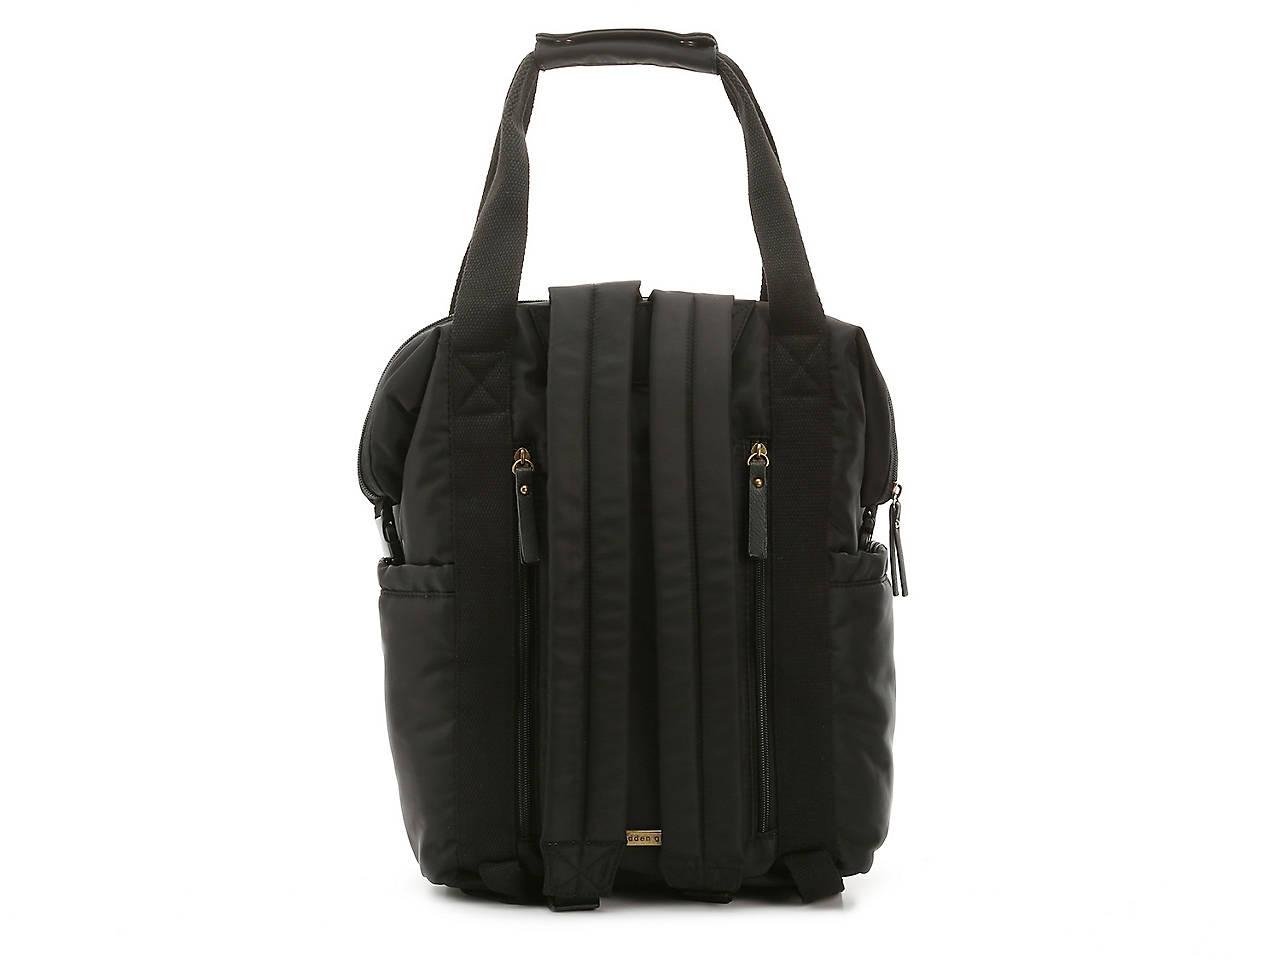 18428796b3 Madden Girl Booker Backpack Women's Handbags & Accessories   DSW